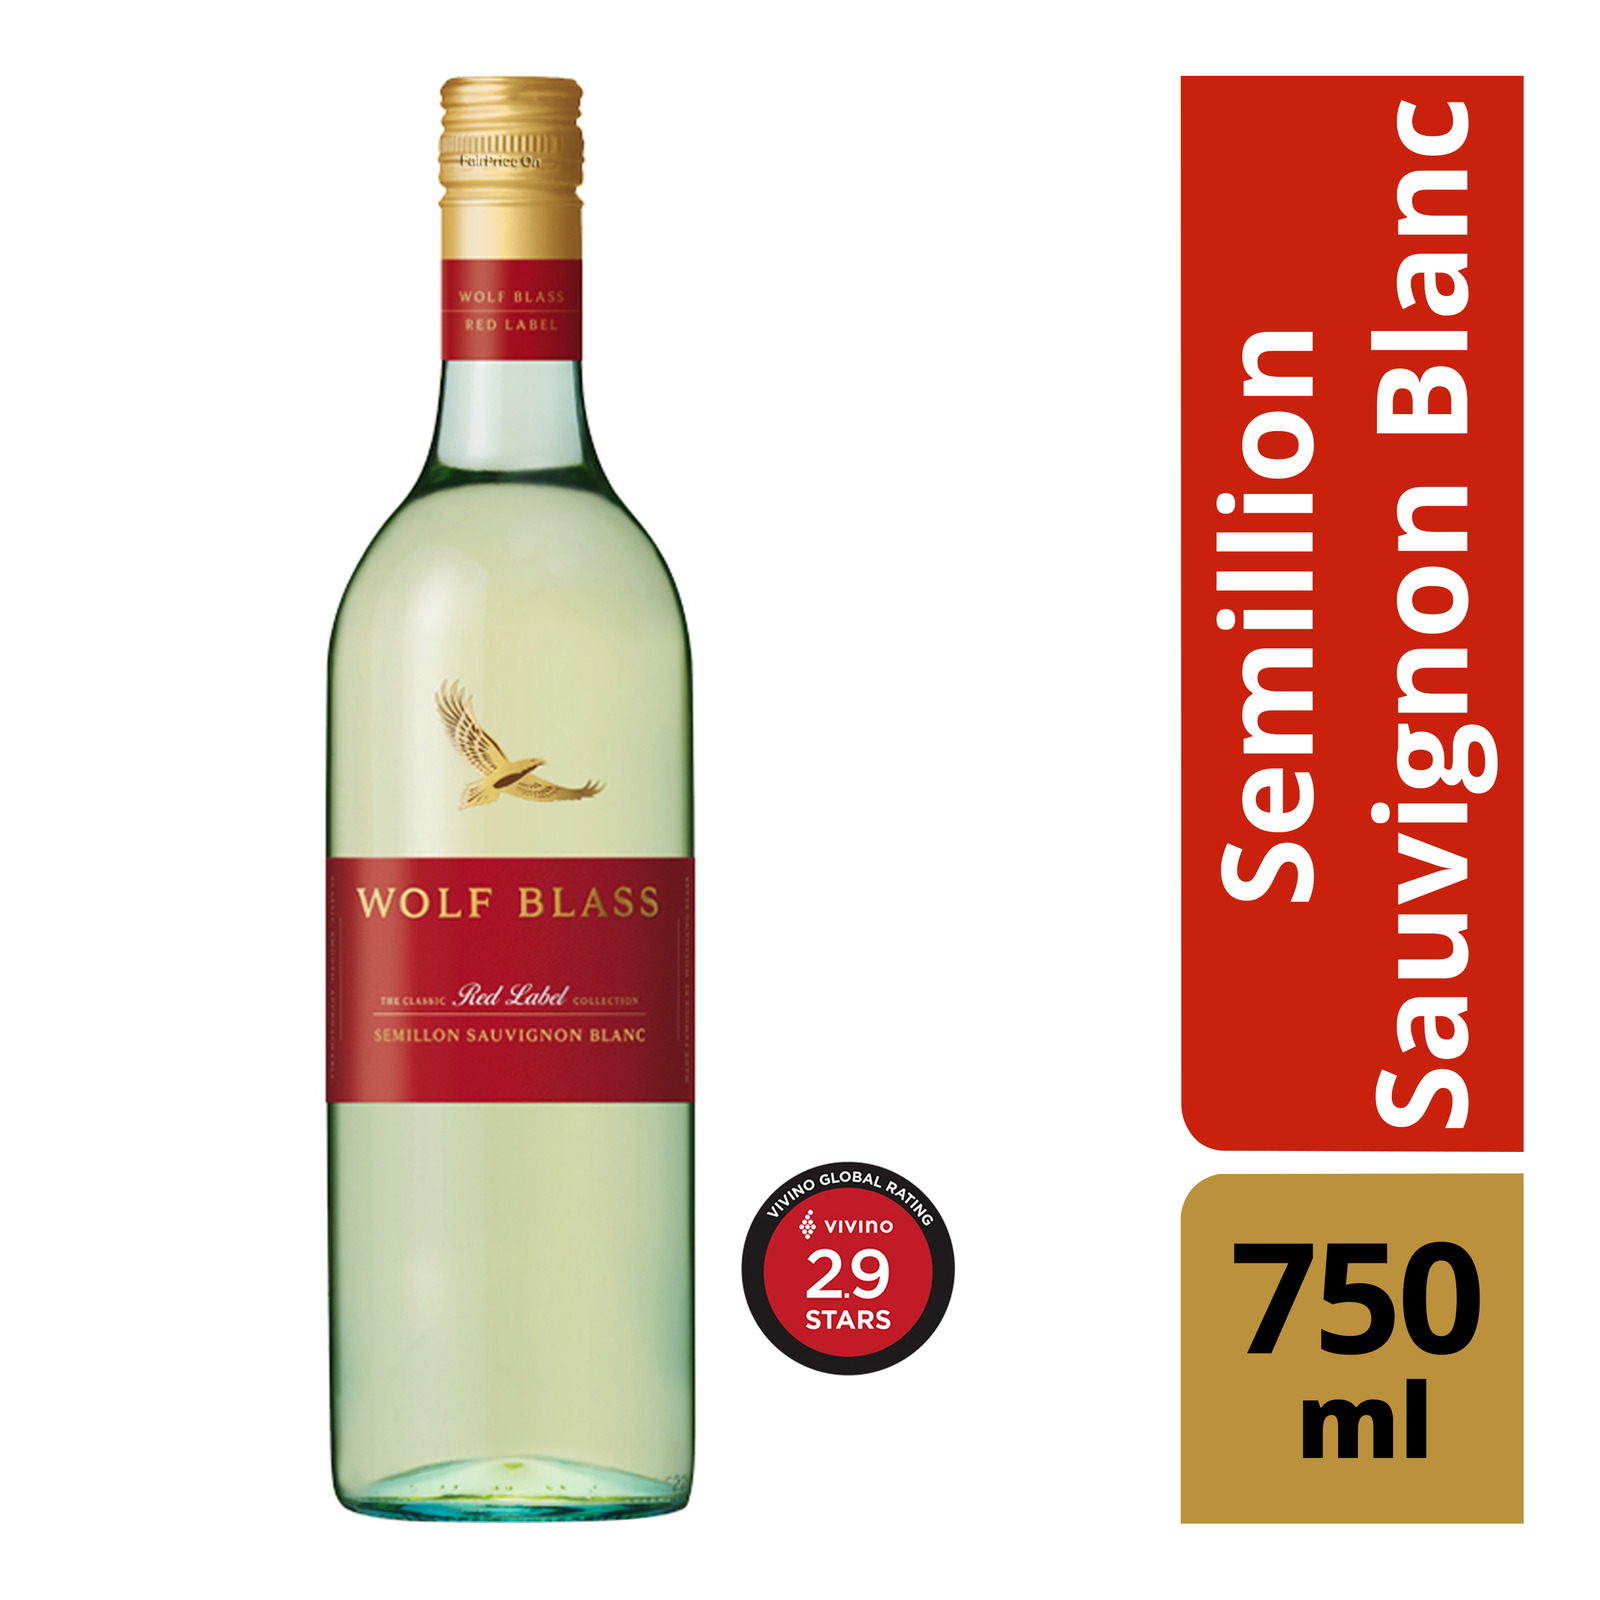 Wolf Blass Red Label White Wine - Semillion Sauvignon Blanc